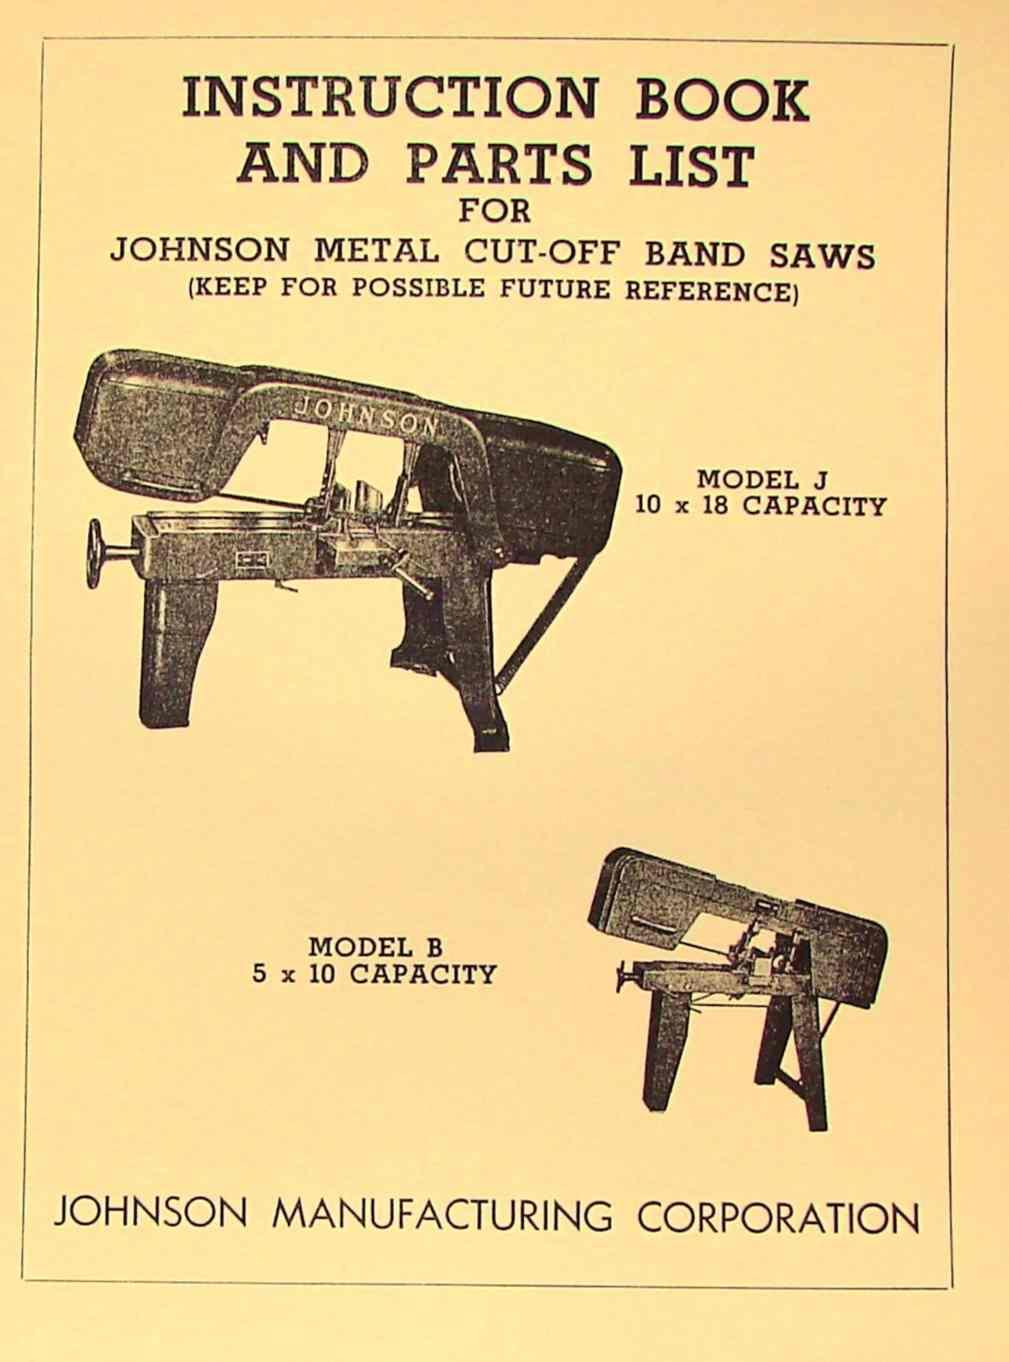 johnson j b metal cutting band saw op part manual ozark tool rh ozarktoolmanuals com Manual Benchtop Bandsaw 12-Inch Craftsman Band Saw Manual